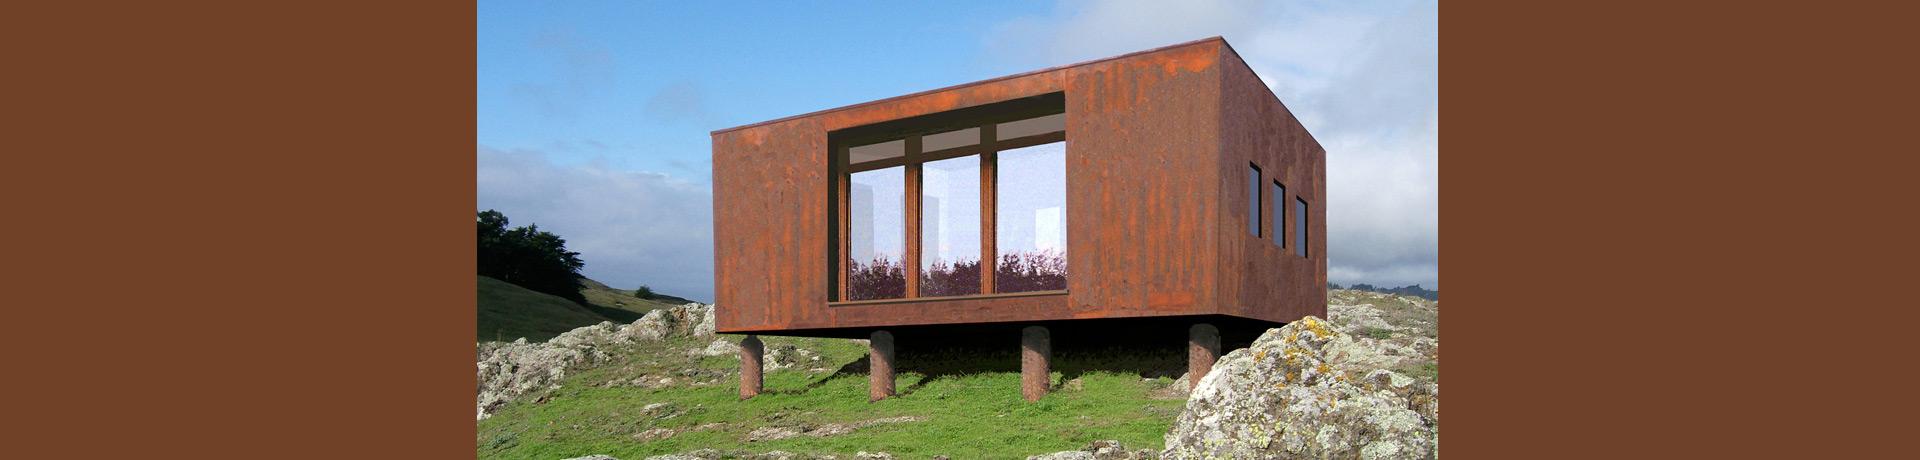 slide8-minihaus